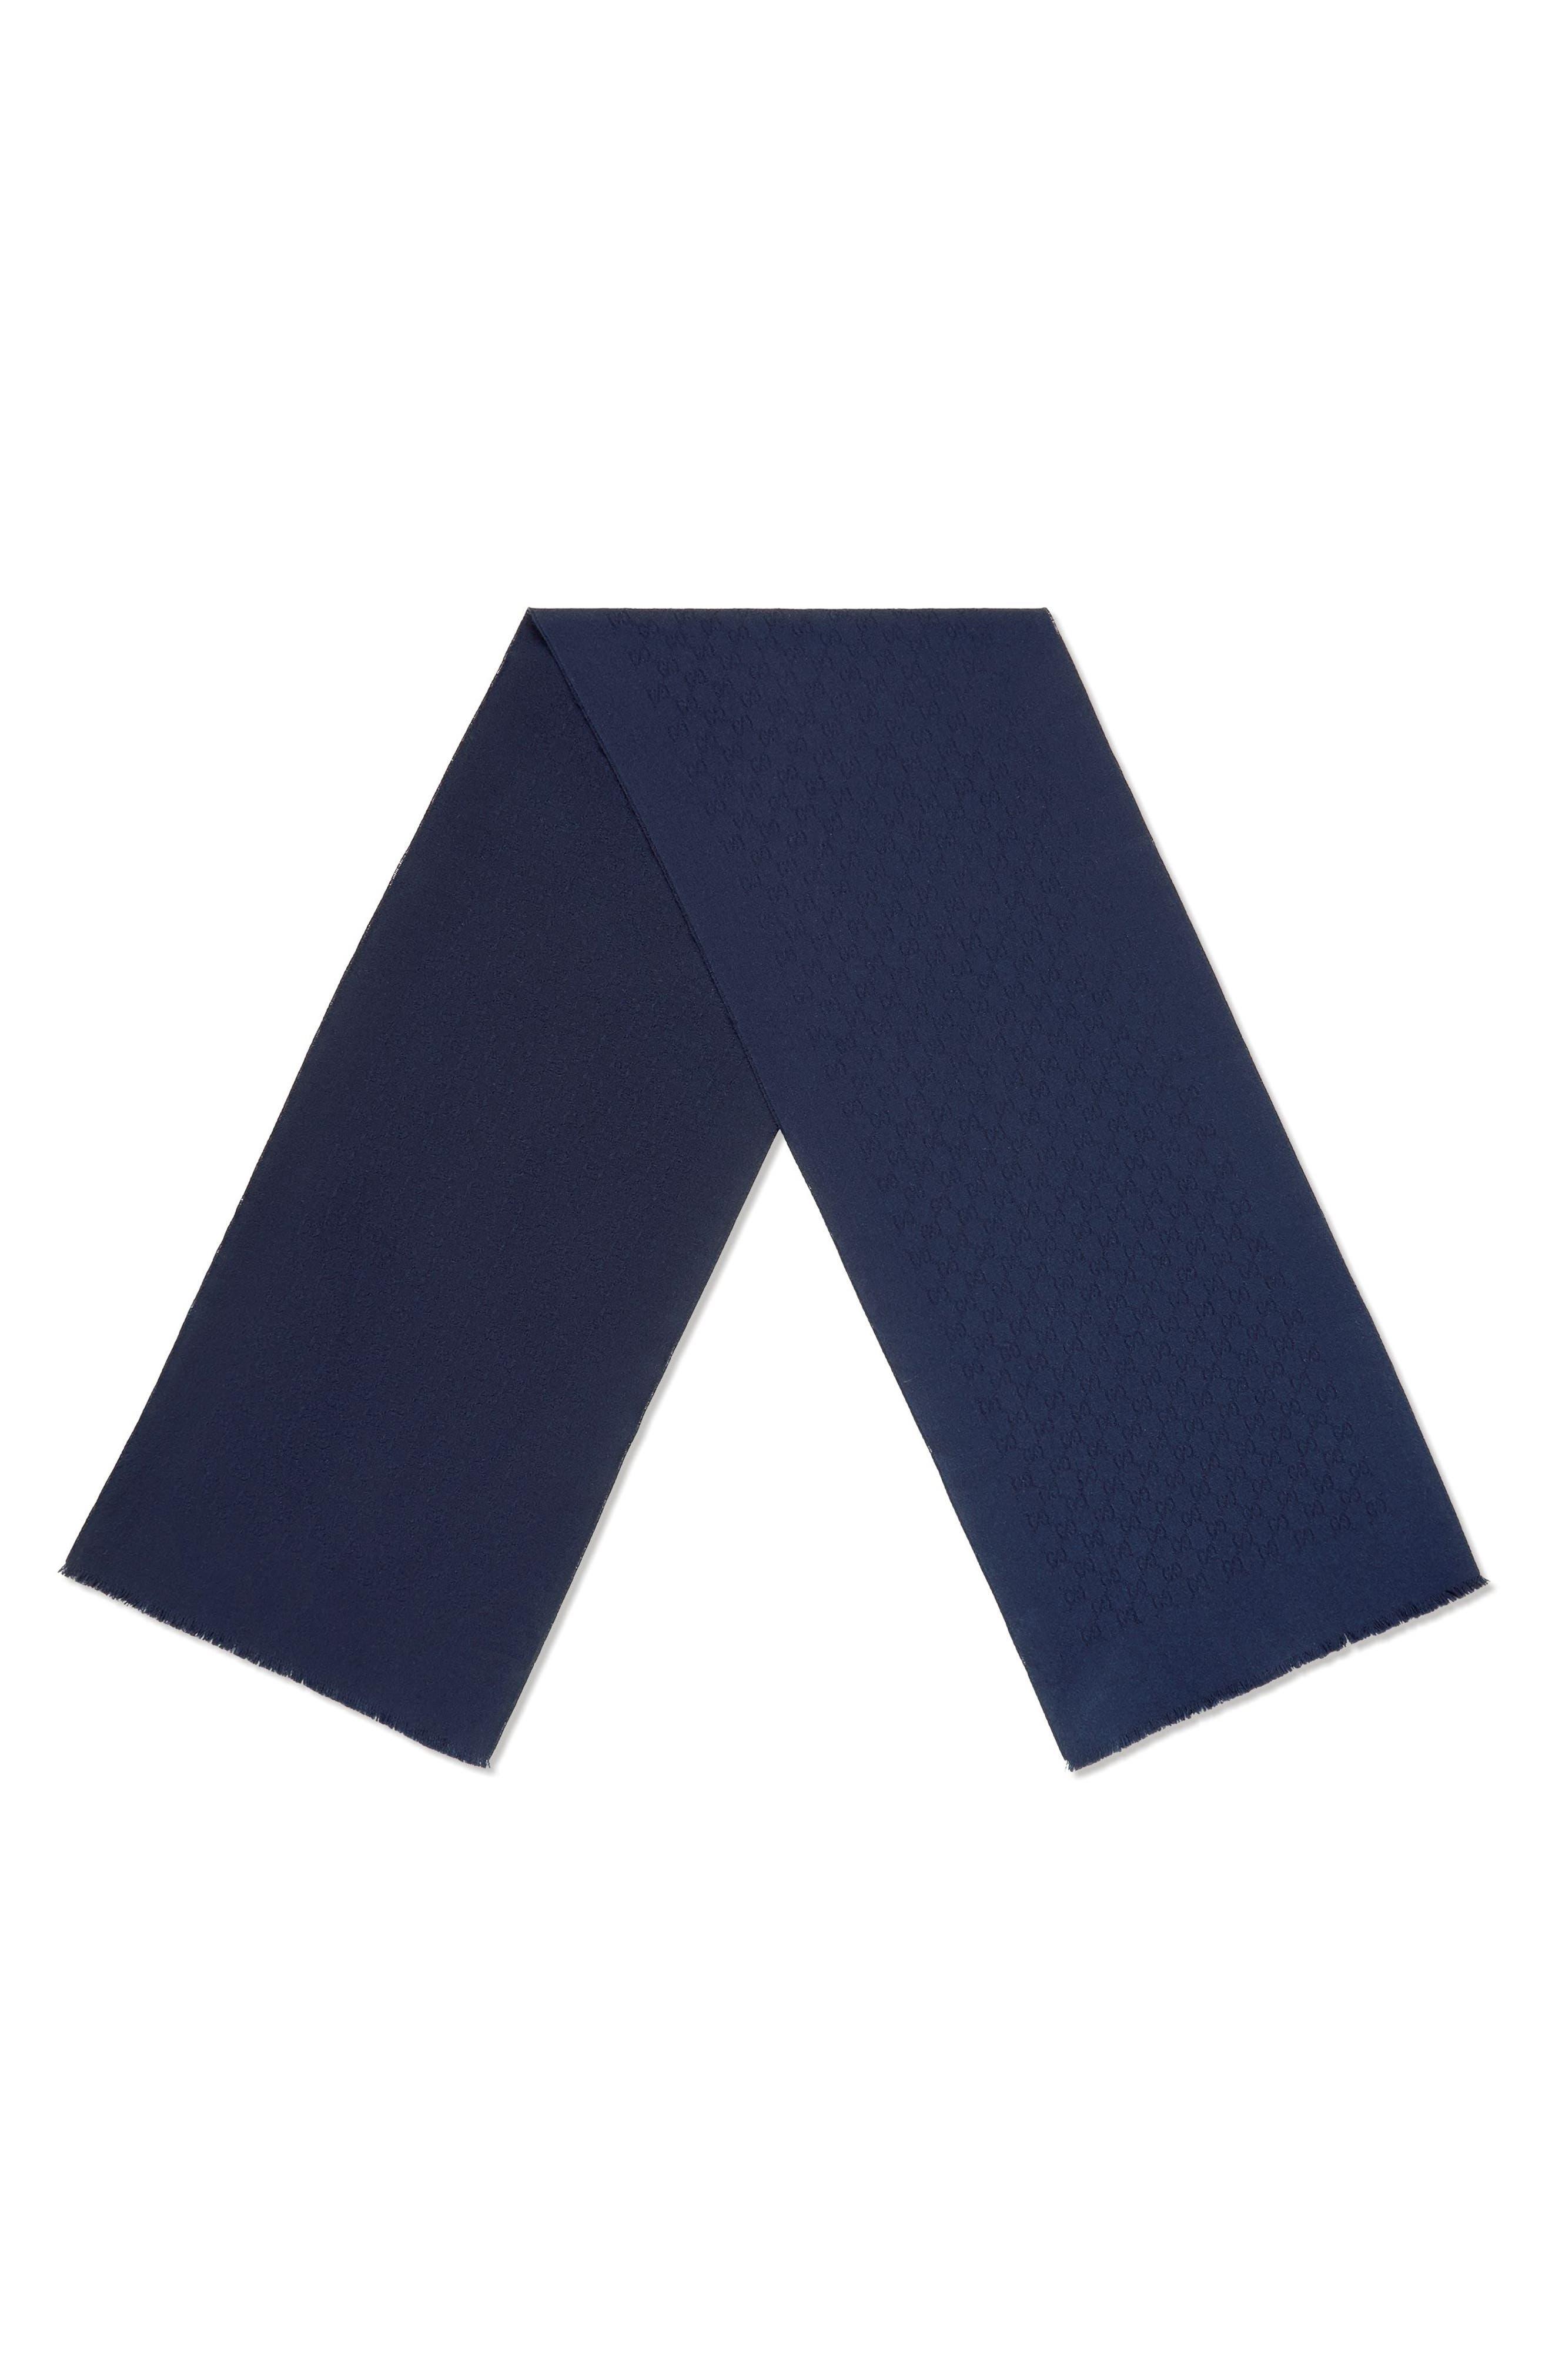 GG Gem Lux Jacquard Cashmere Scarf,                             Alternate thumbnail 2, color,                             4000 Midnight Blue